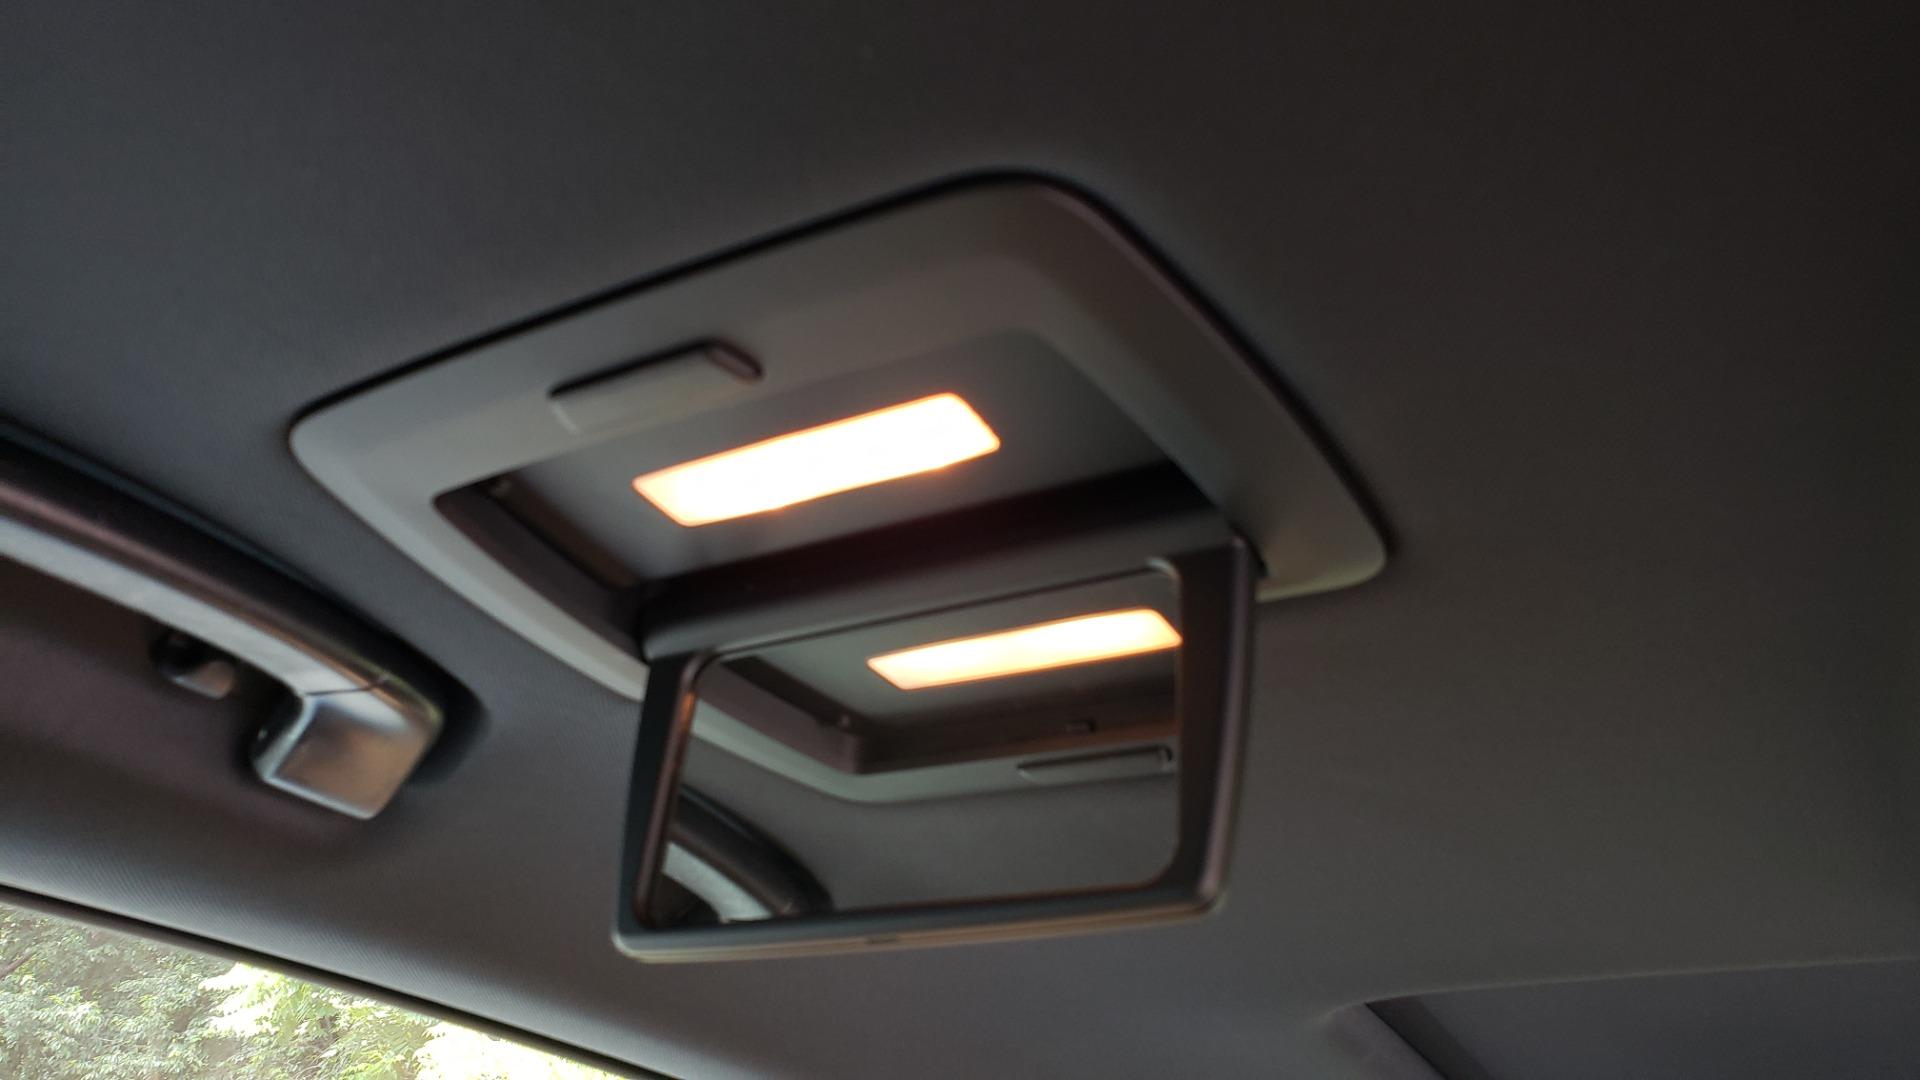 Used 2014 BMW 7 SERIES 750LI M-SPORT / EXEC PKG / DRVR ASST / LIGHTING / NAV / SUNROOF for sale Sold at Formula Imports in Charlotte NC 28227 77